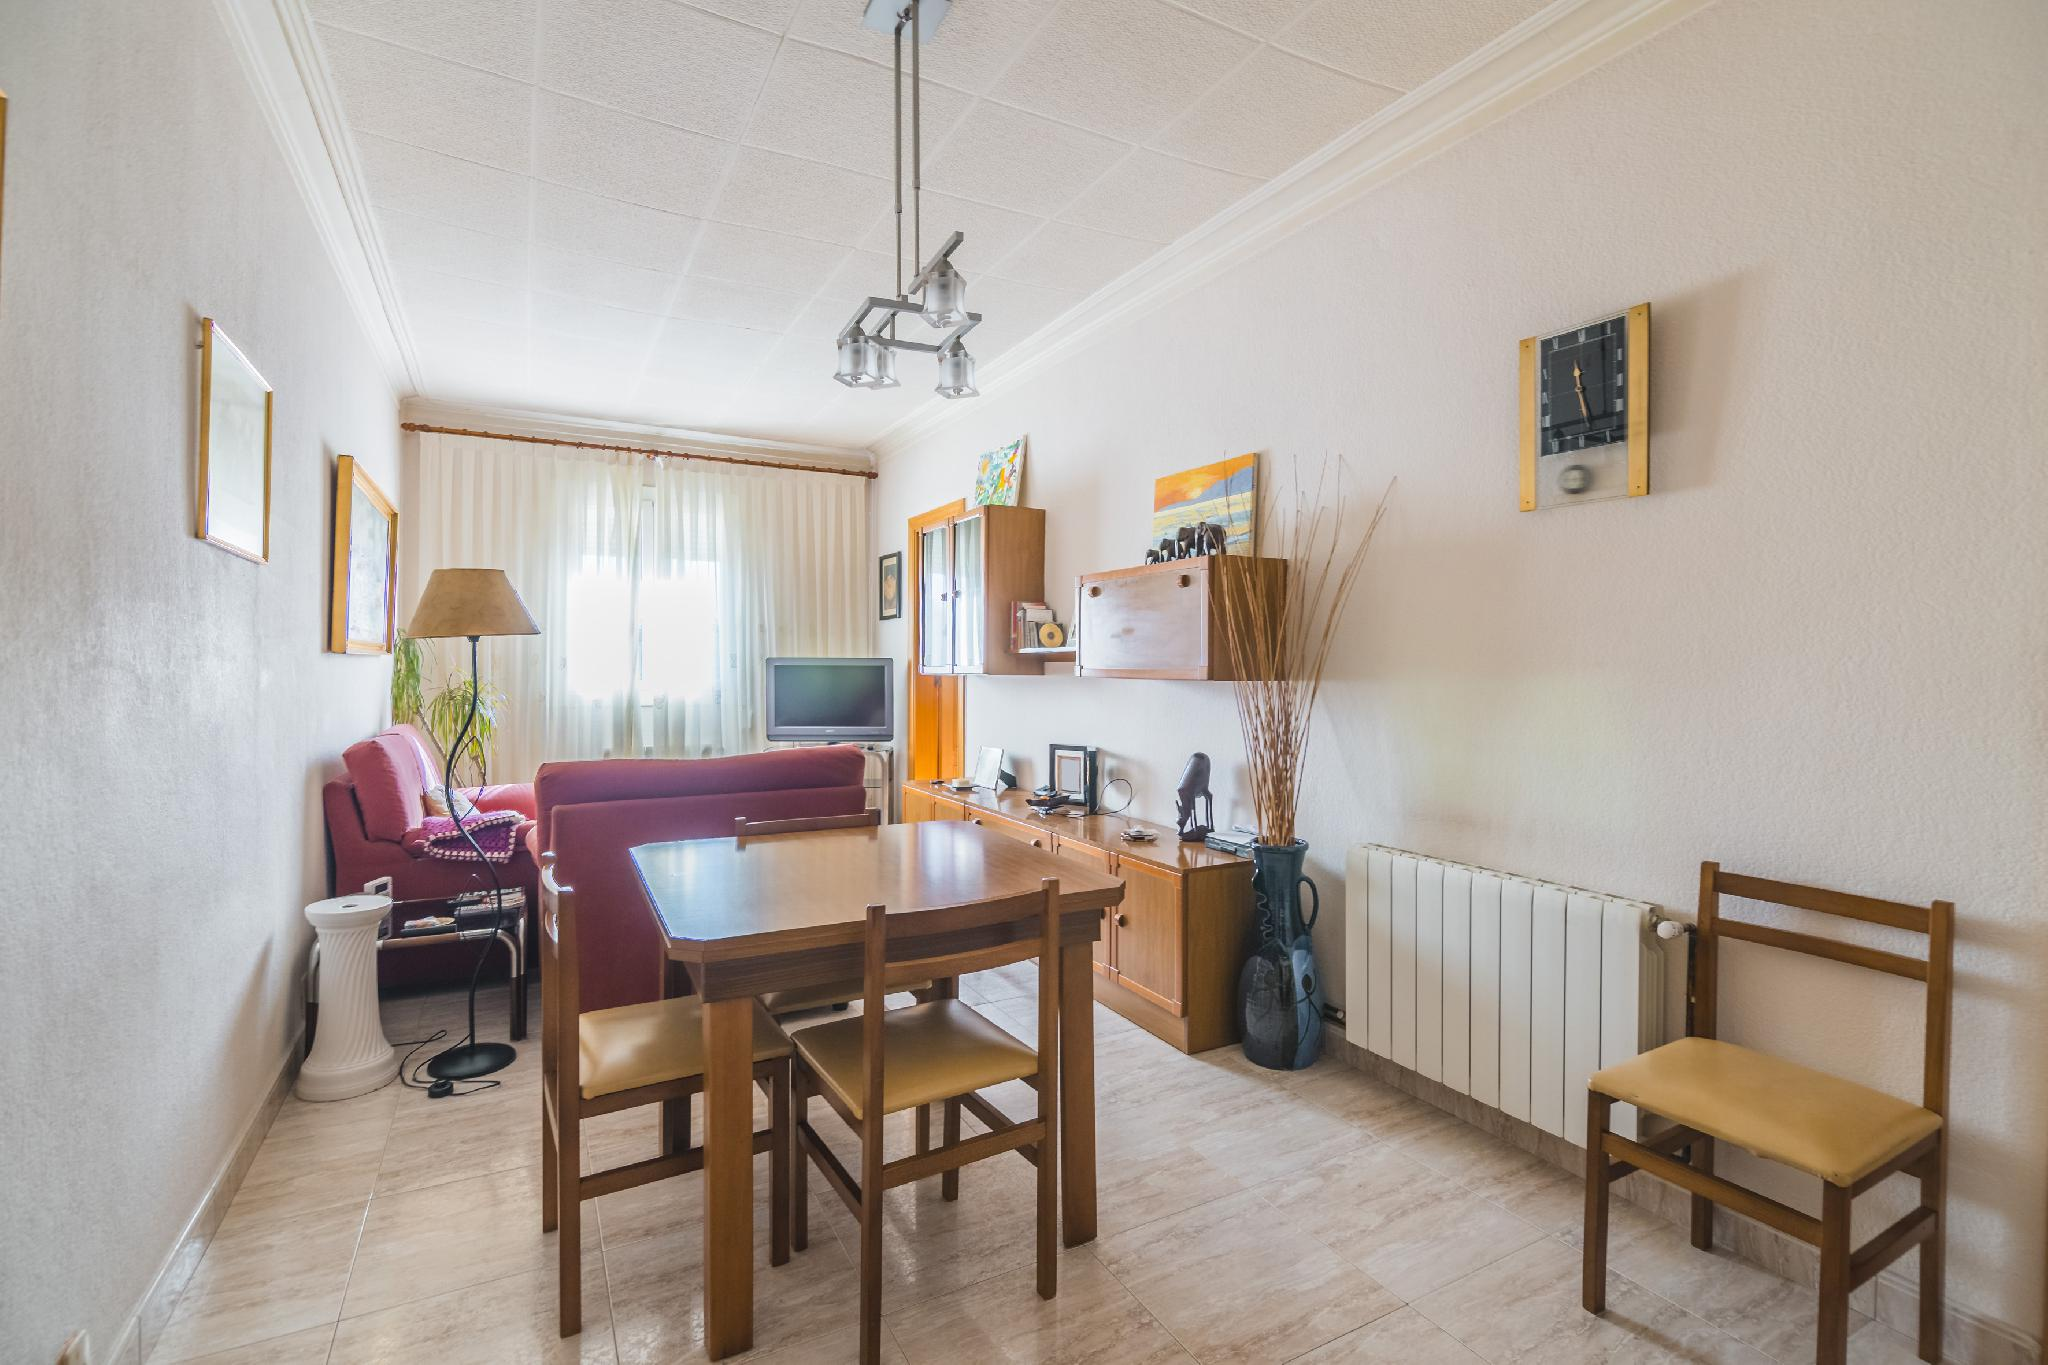 Comprar un apartamento en The Barcelona